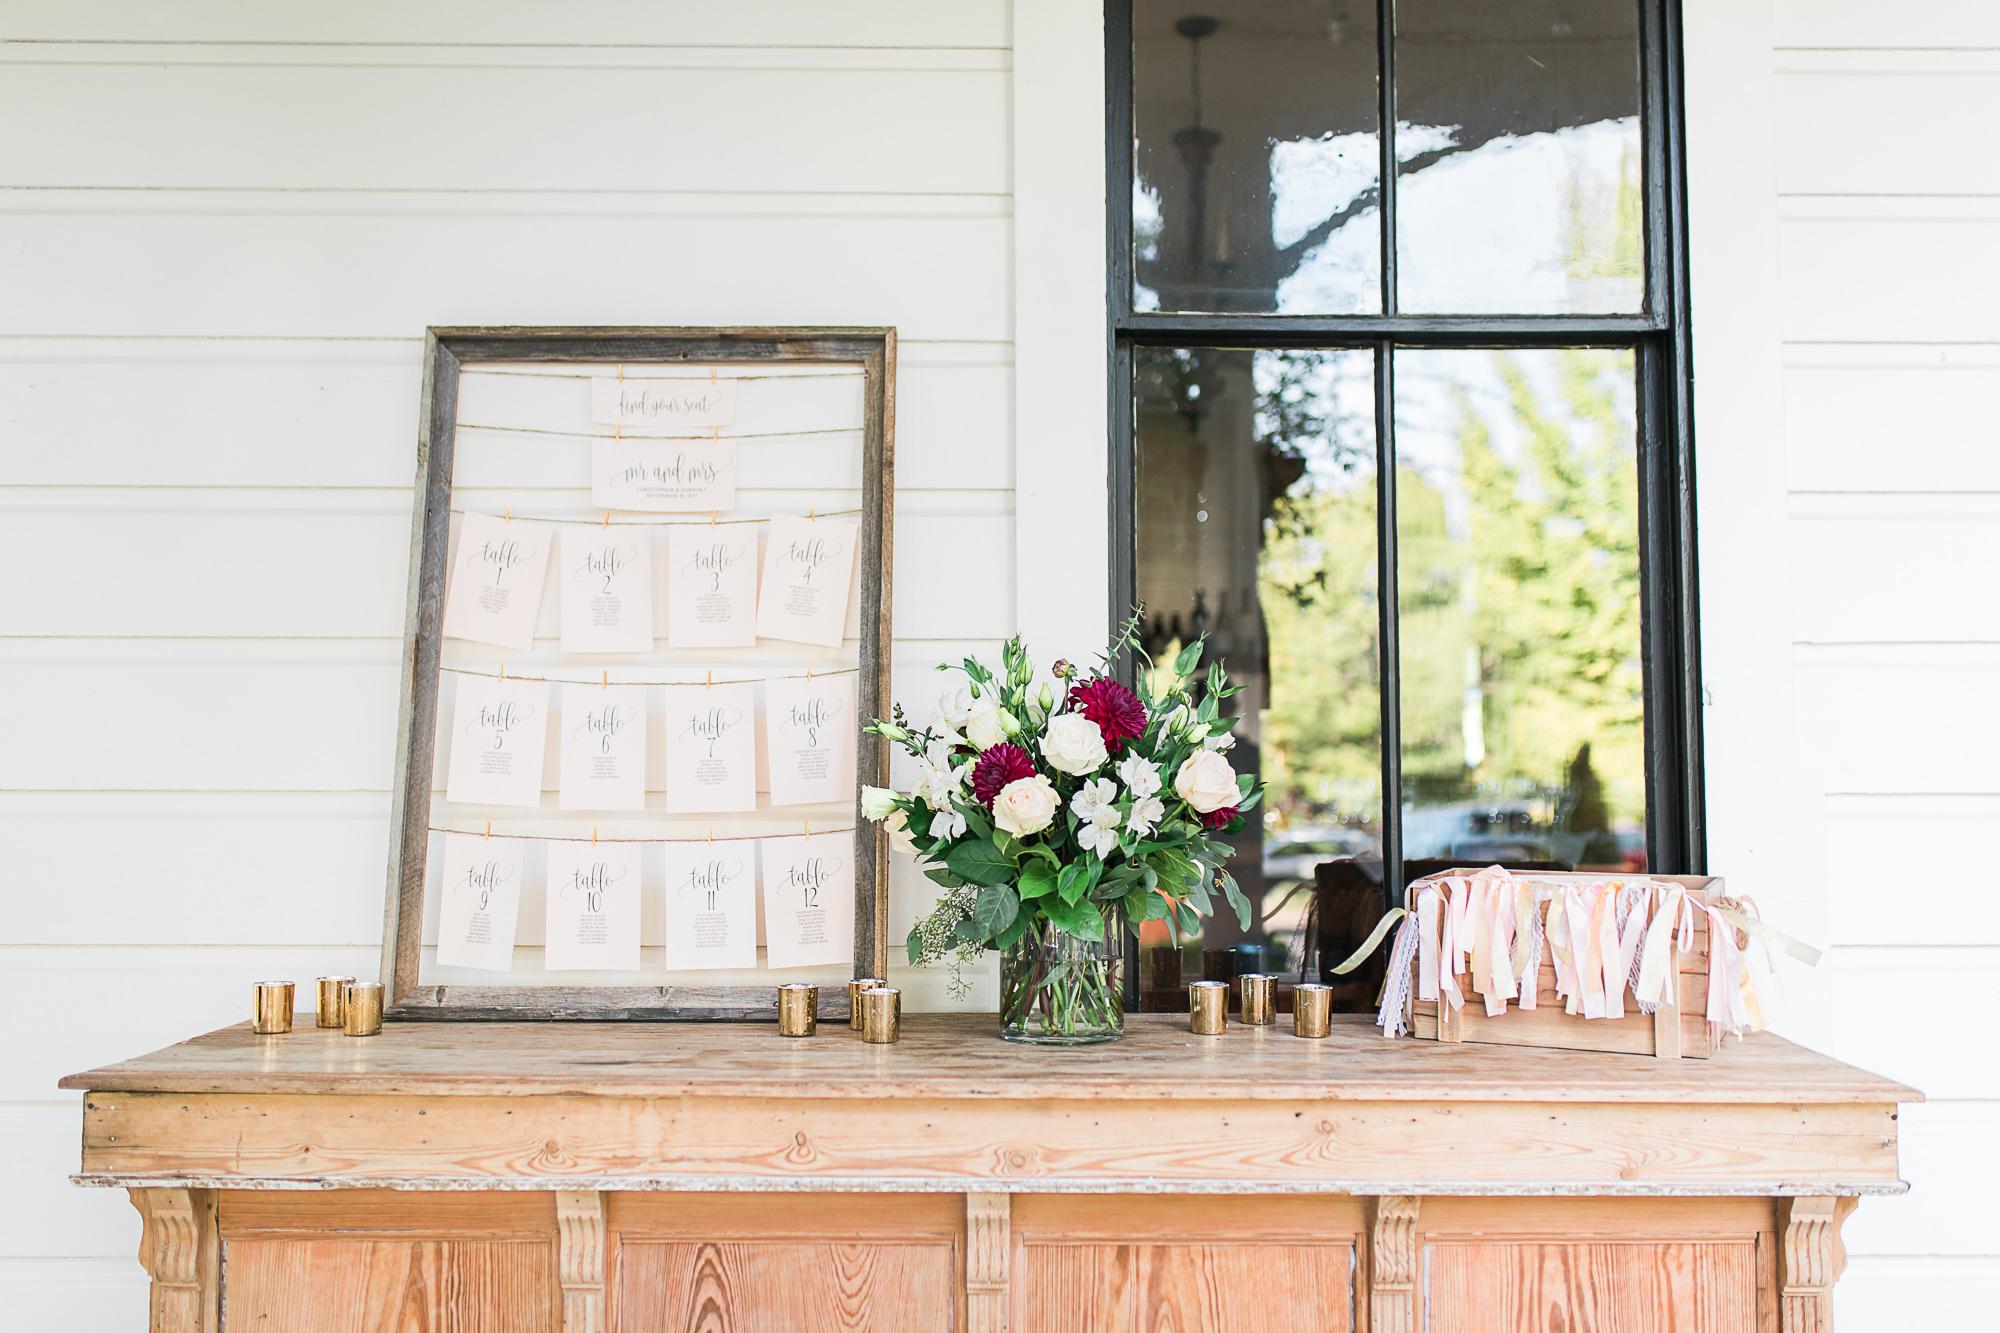 Generals+Daughter+Wedding+Photos+by+JBJ+Pictures+-+Ramekins+Wedding+Venue+Photographer+in+Sonoma+Napa+(21).jpg